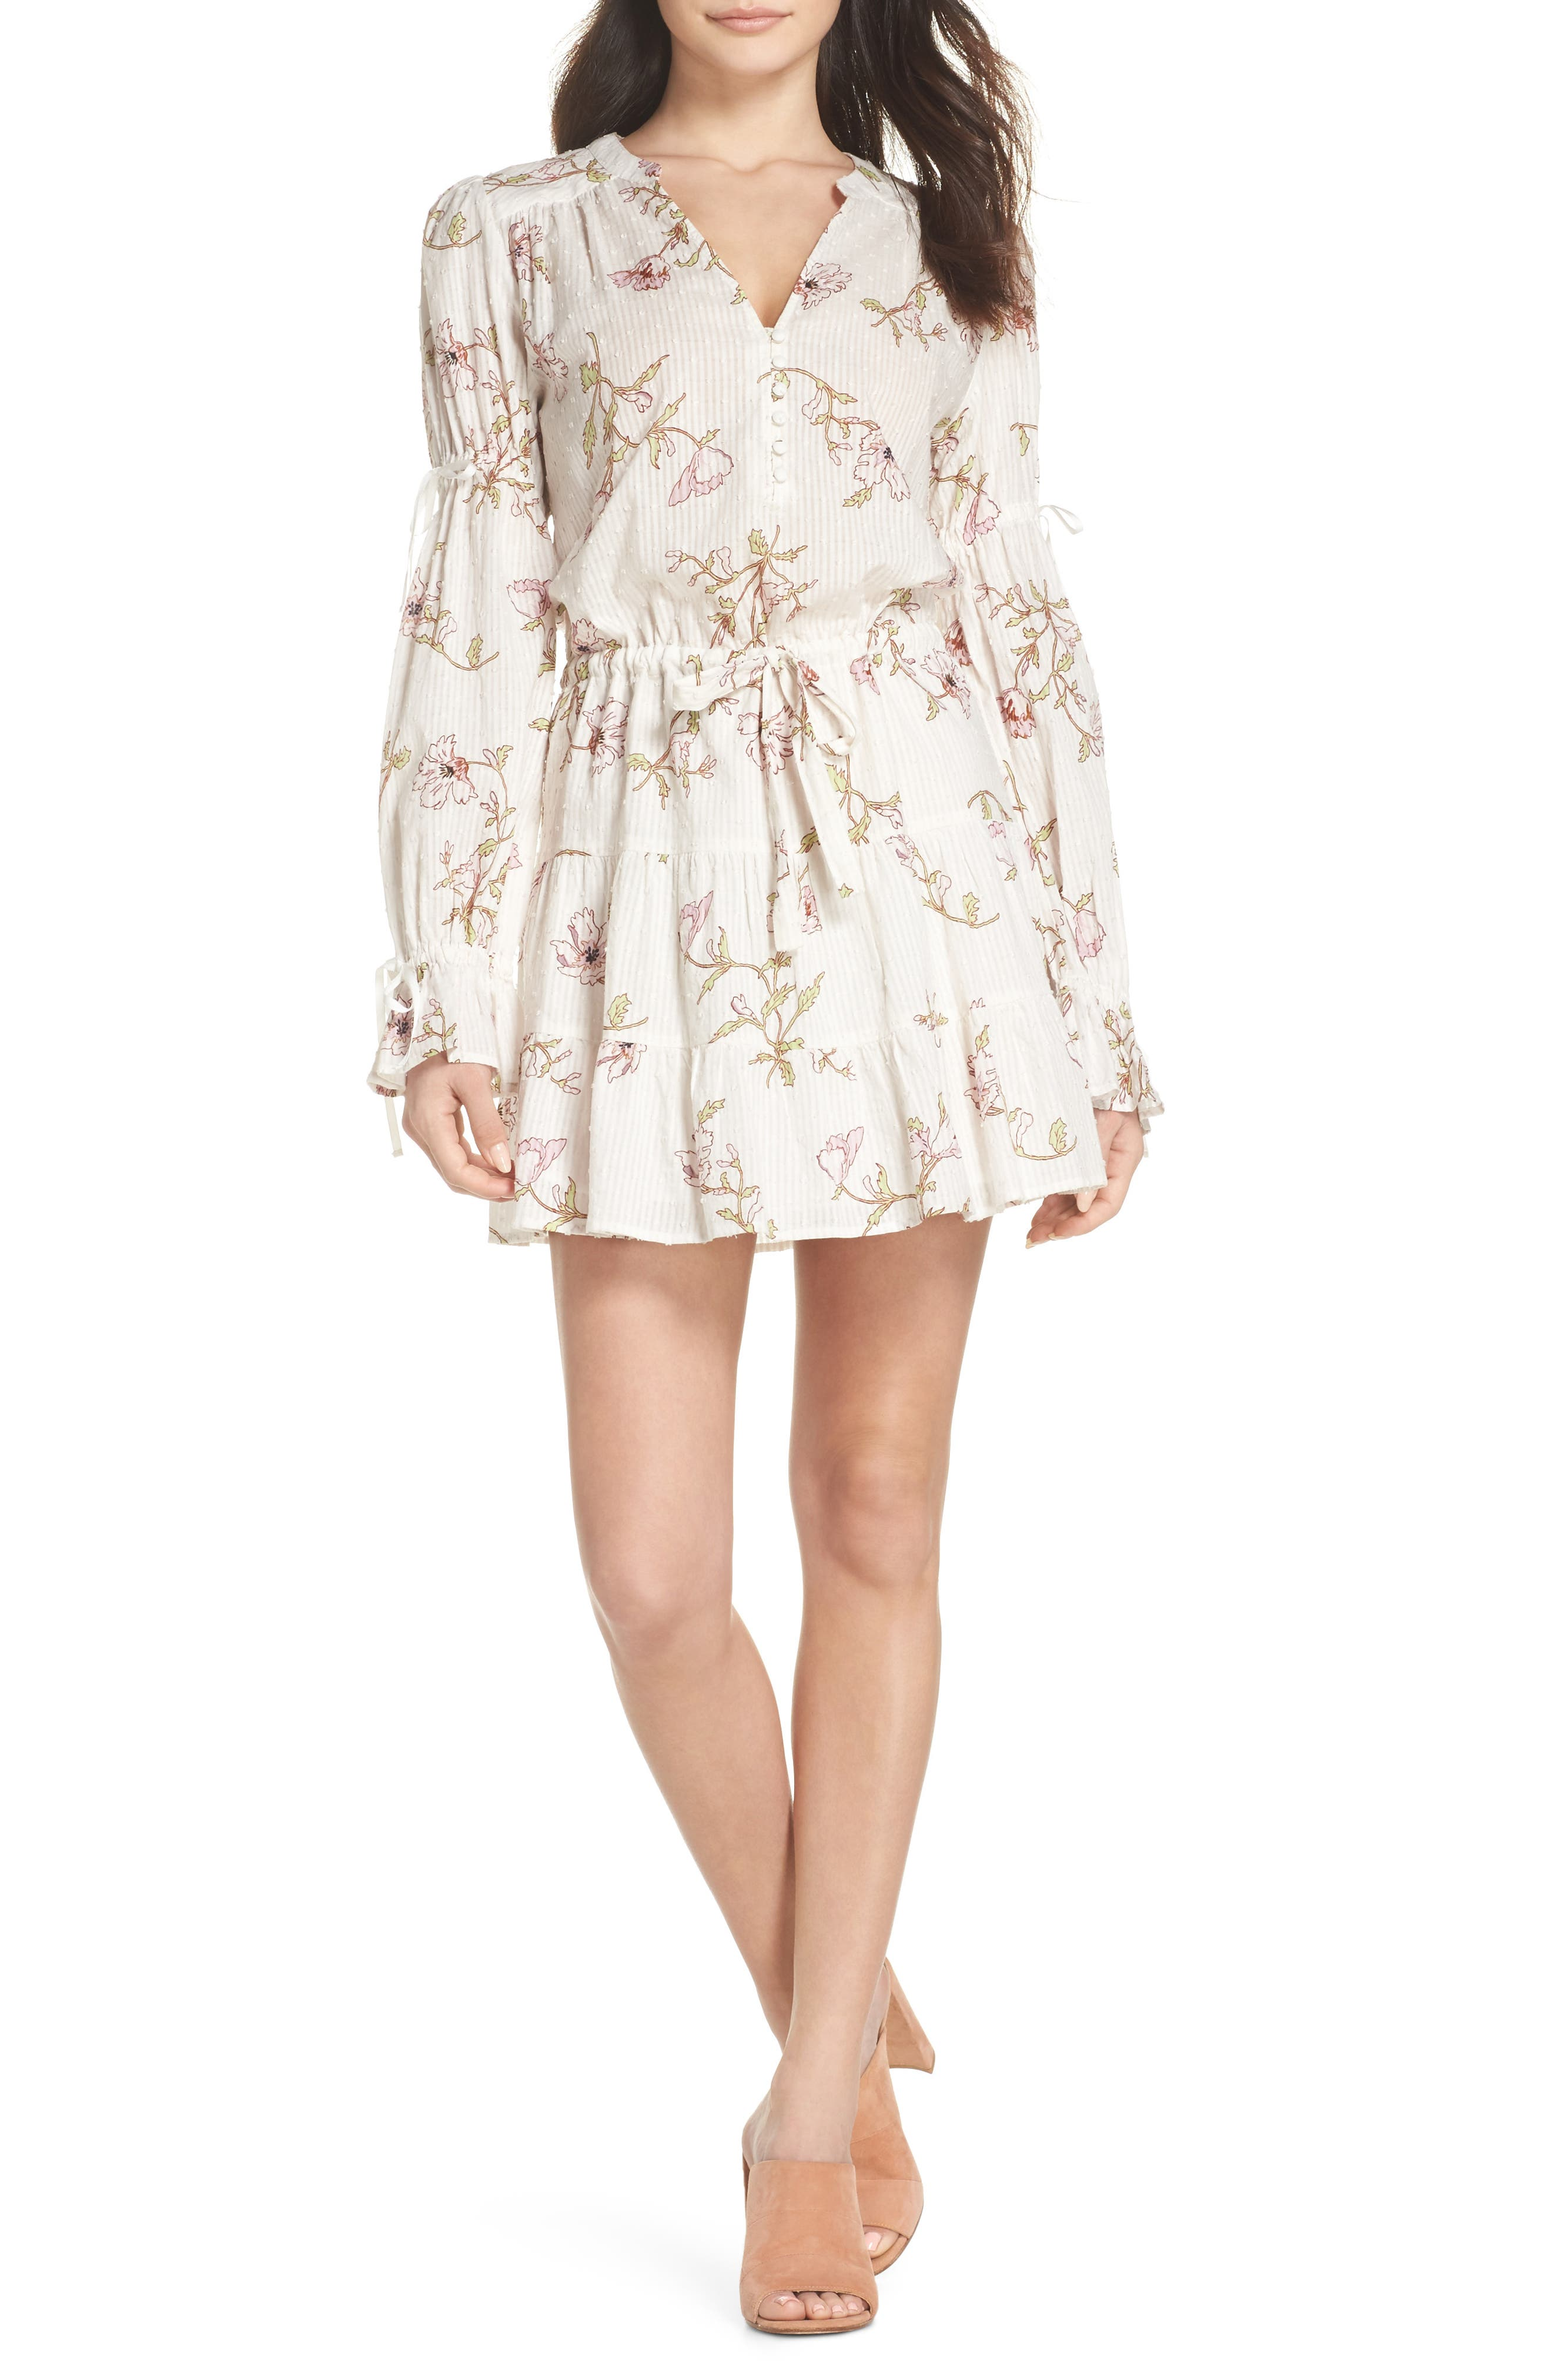 Yardley Floral Minidress,                             Main thumbnail 1, color,                             WHITE / MAUVE SHADOWS